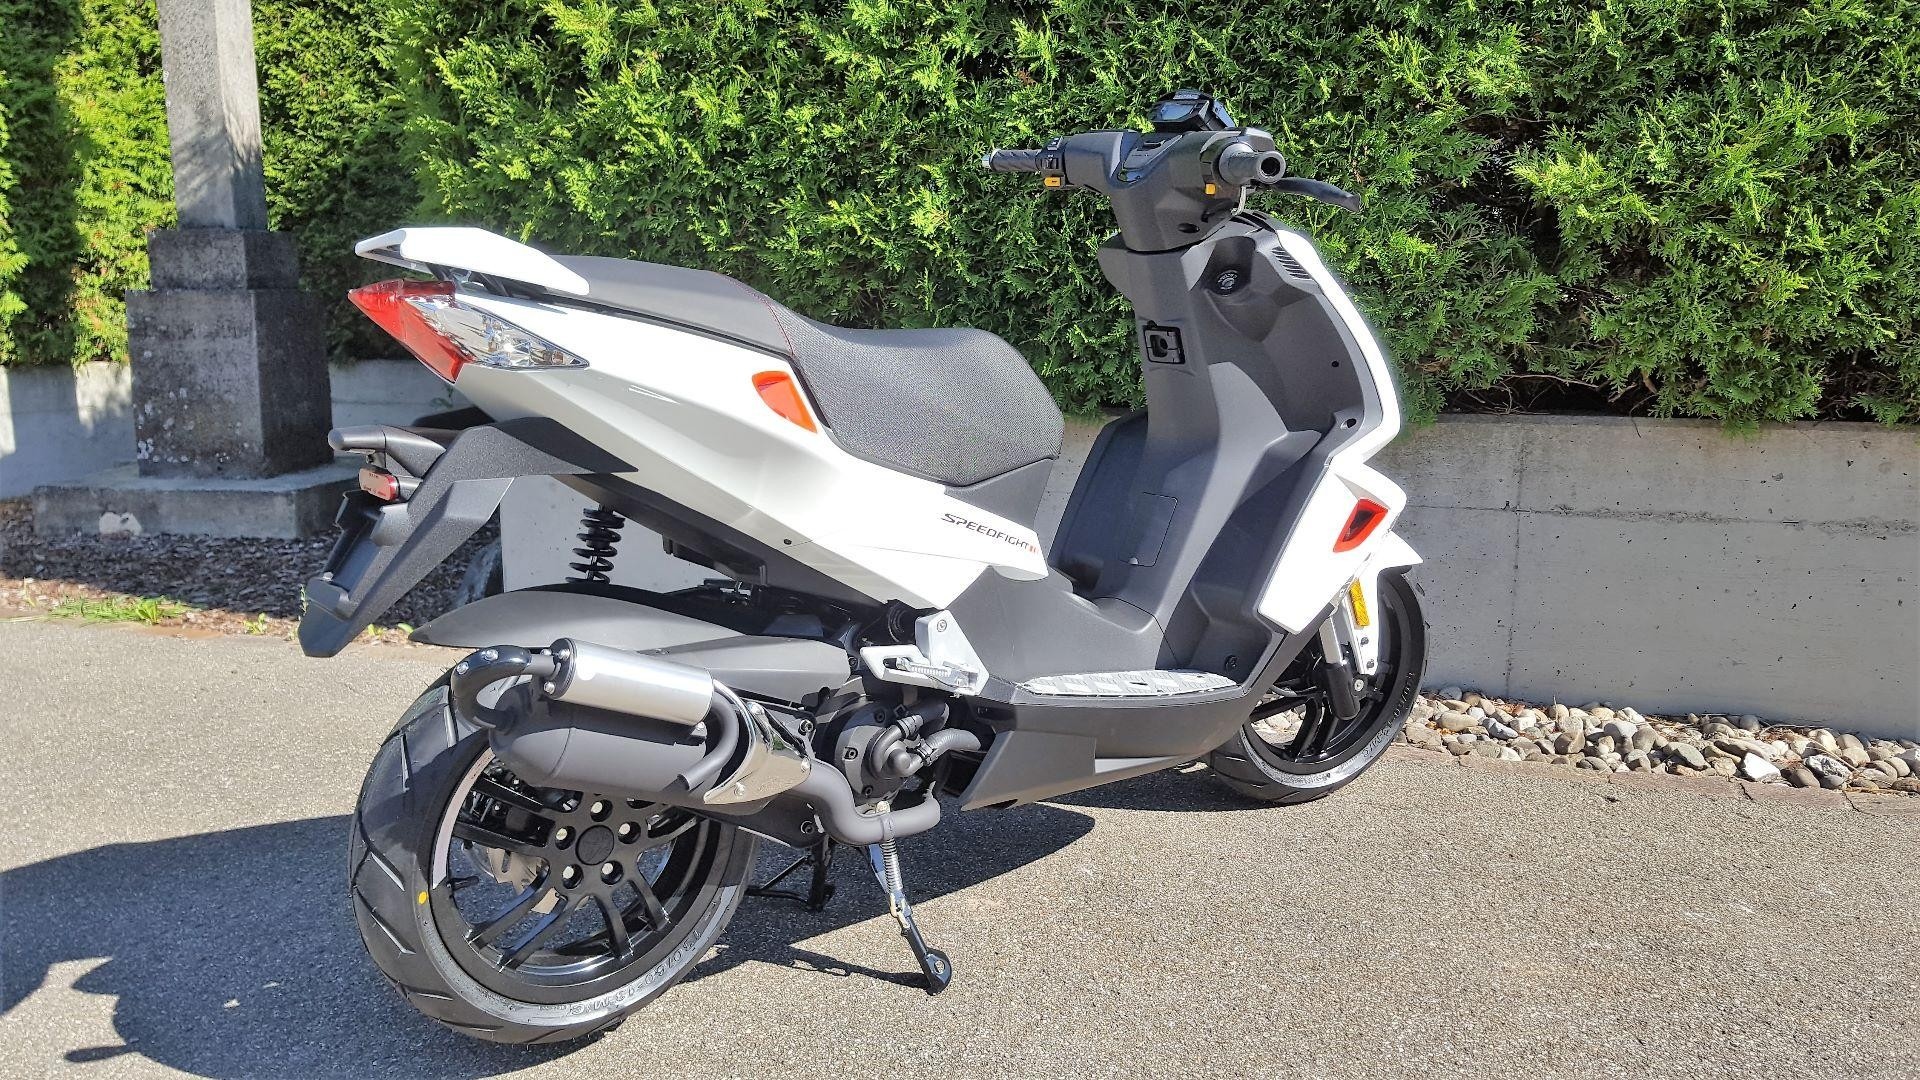 moto neuve acheter peugeot speedfight 4 50 il moto west. Black Bedroom Furniture Sets. Home Design Ideas